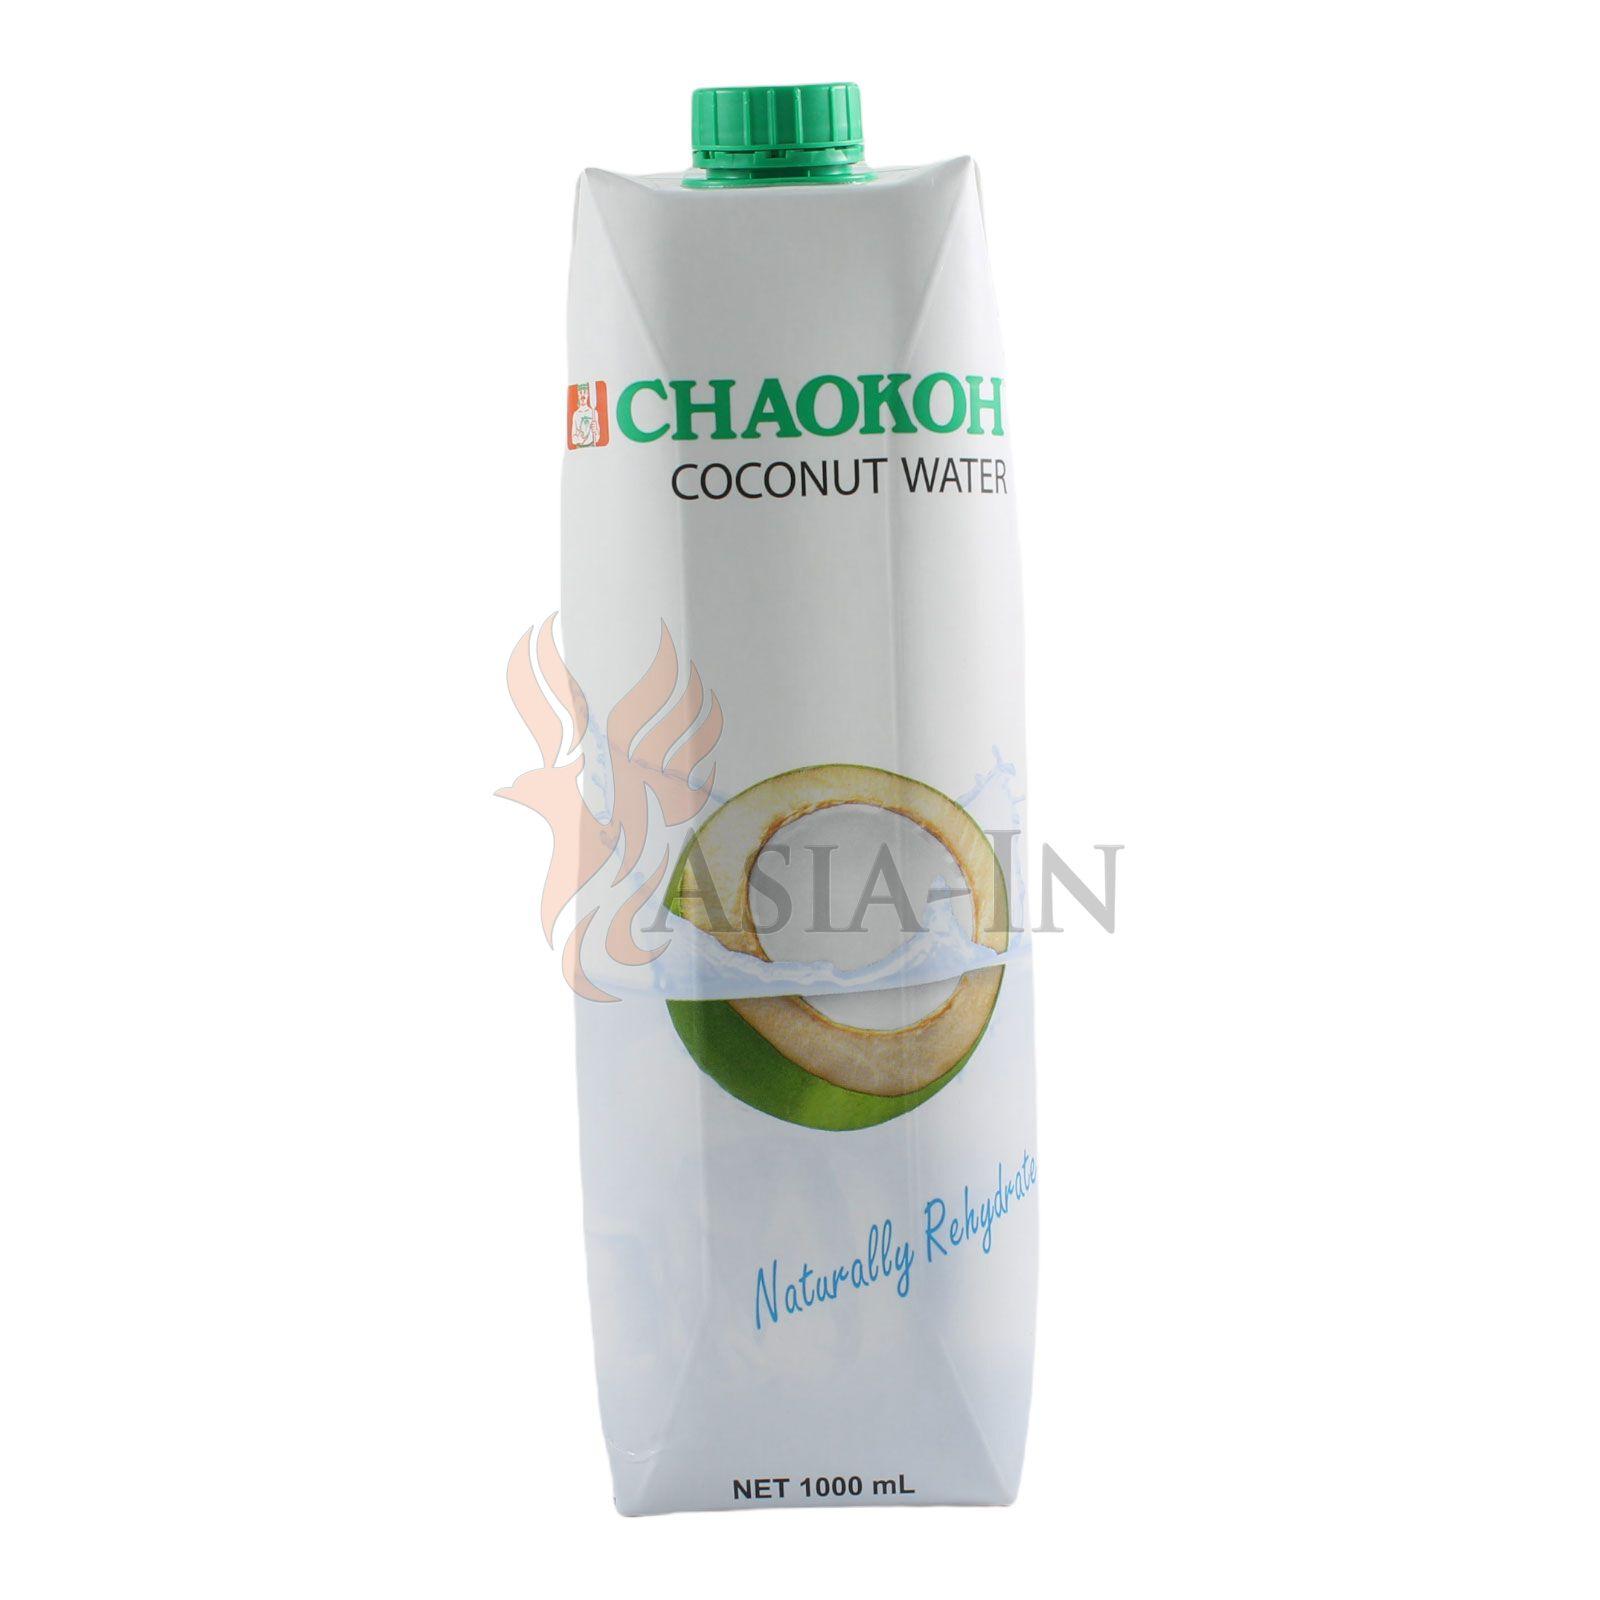 kokosnuss wasser coconut water chaokoh 1l. Black Bedroom Furniture Sets. Home Design Ideas